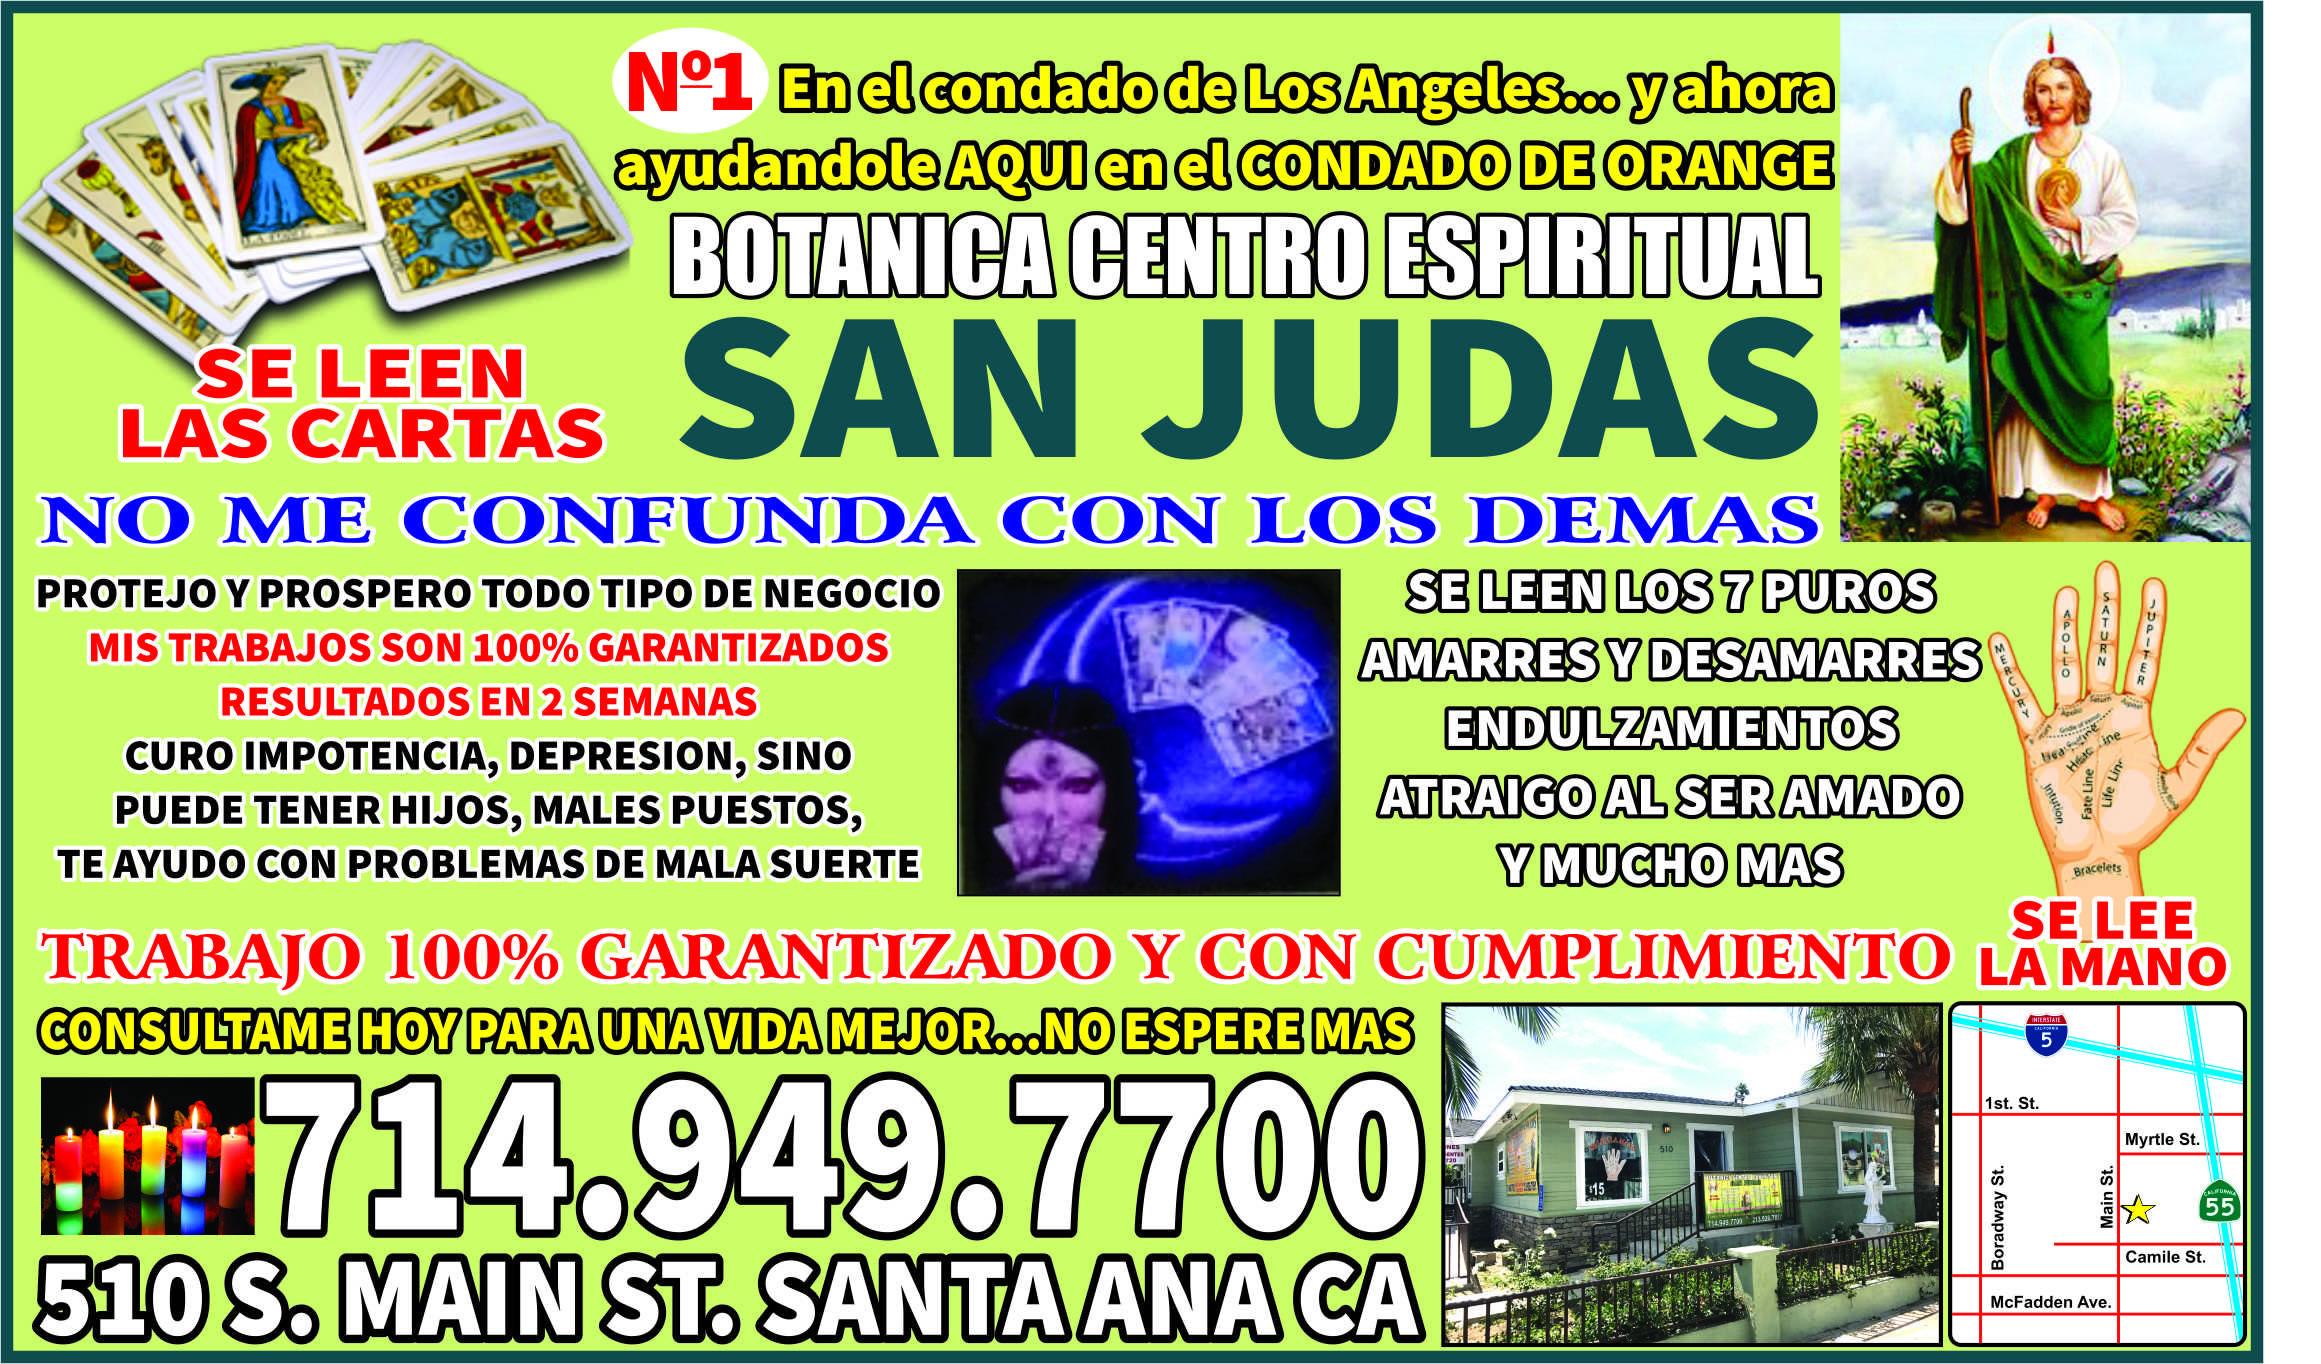 Botanica Centro Espiritual San Judas Videntes # Muebles San Judas